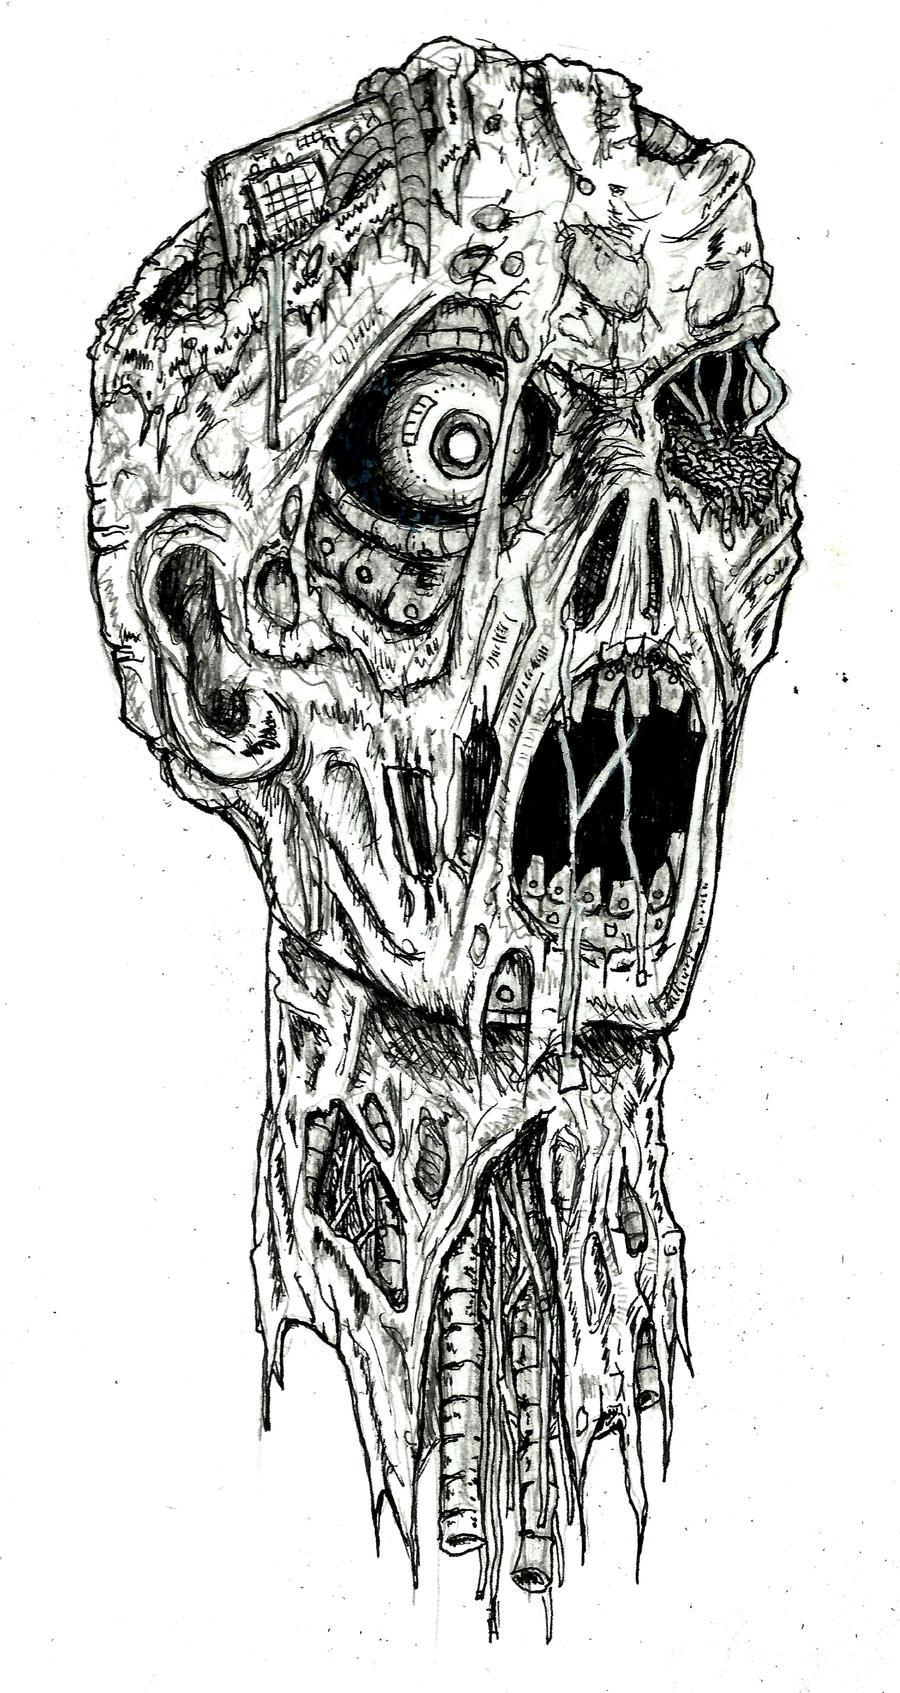 robot zombie by ayillustrations on DeviantArt